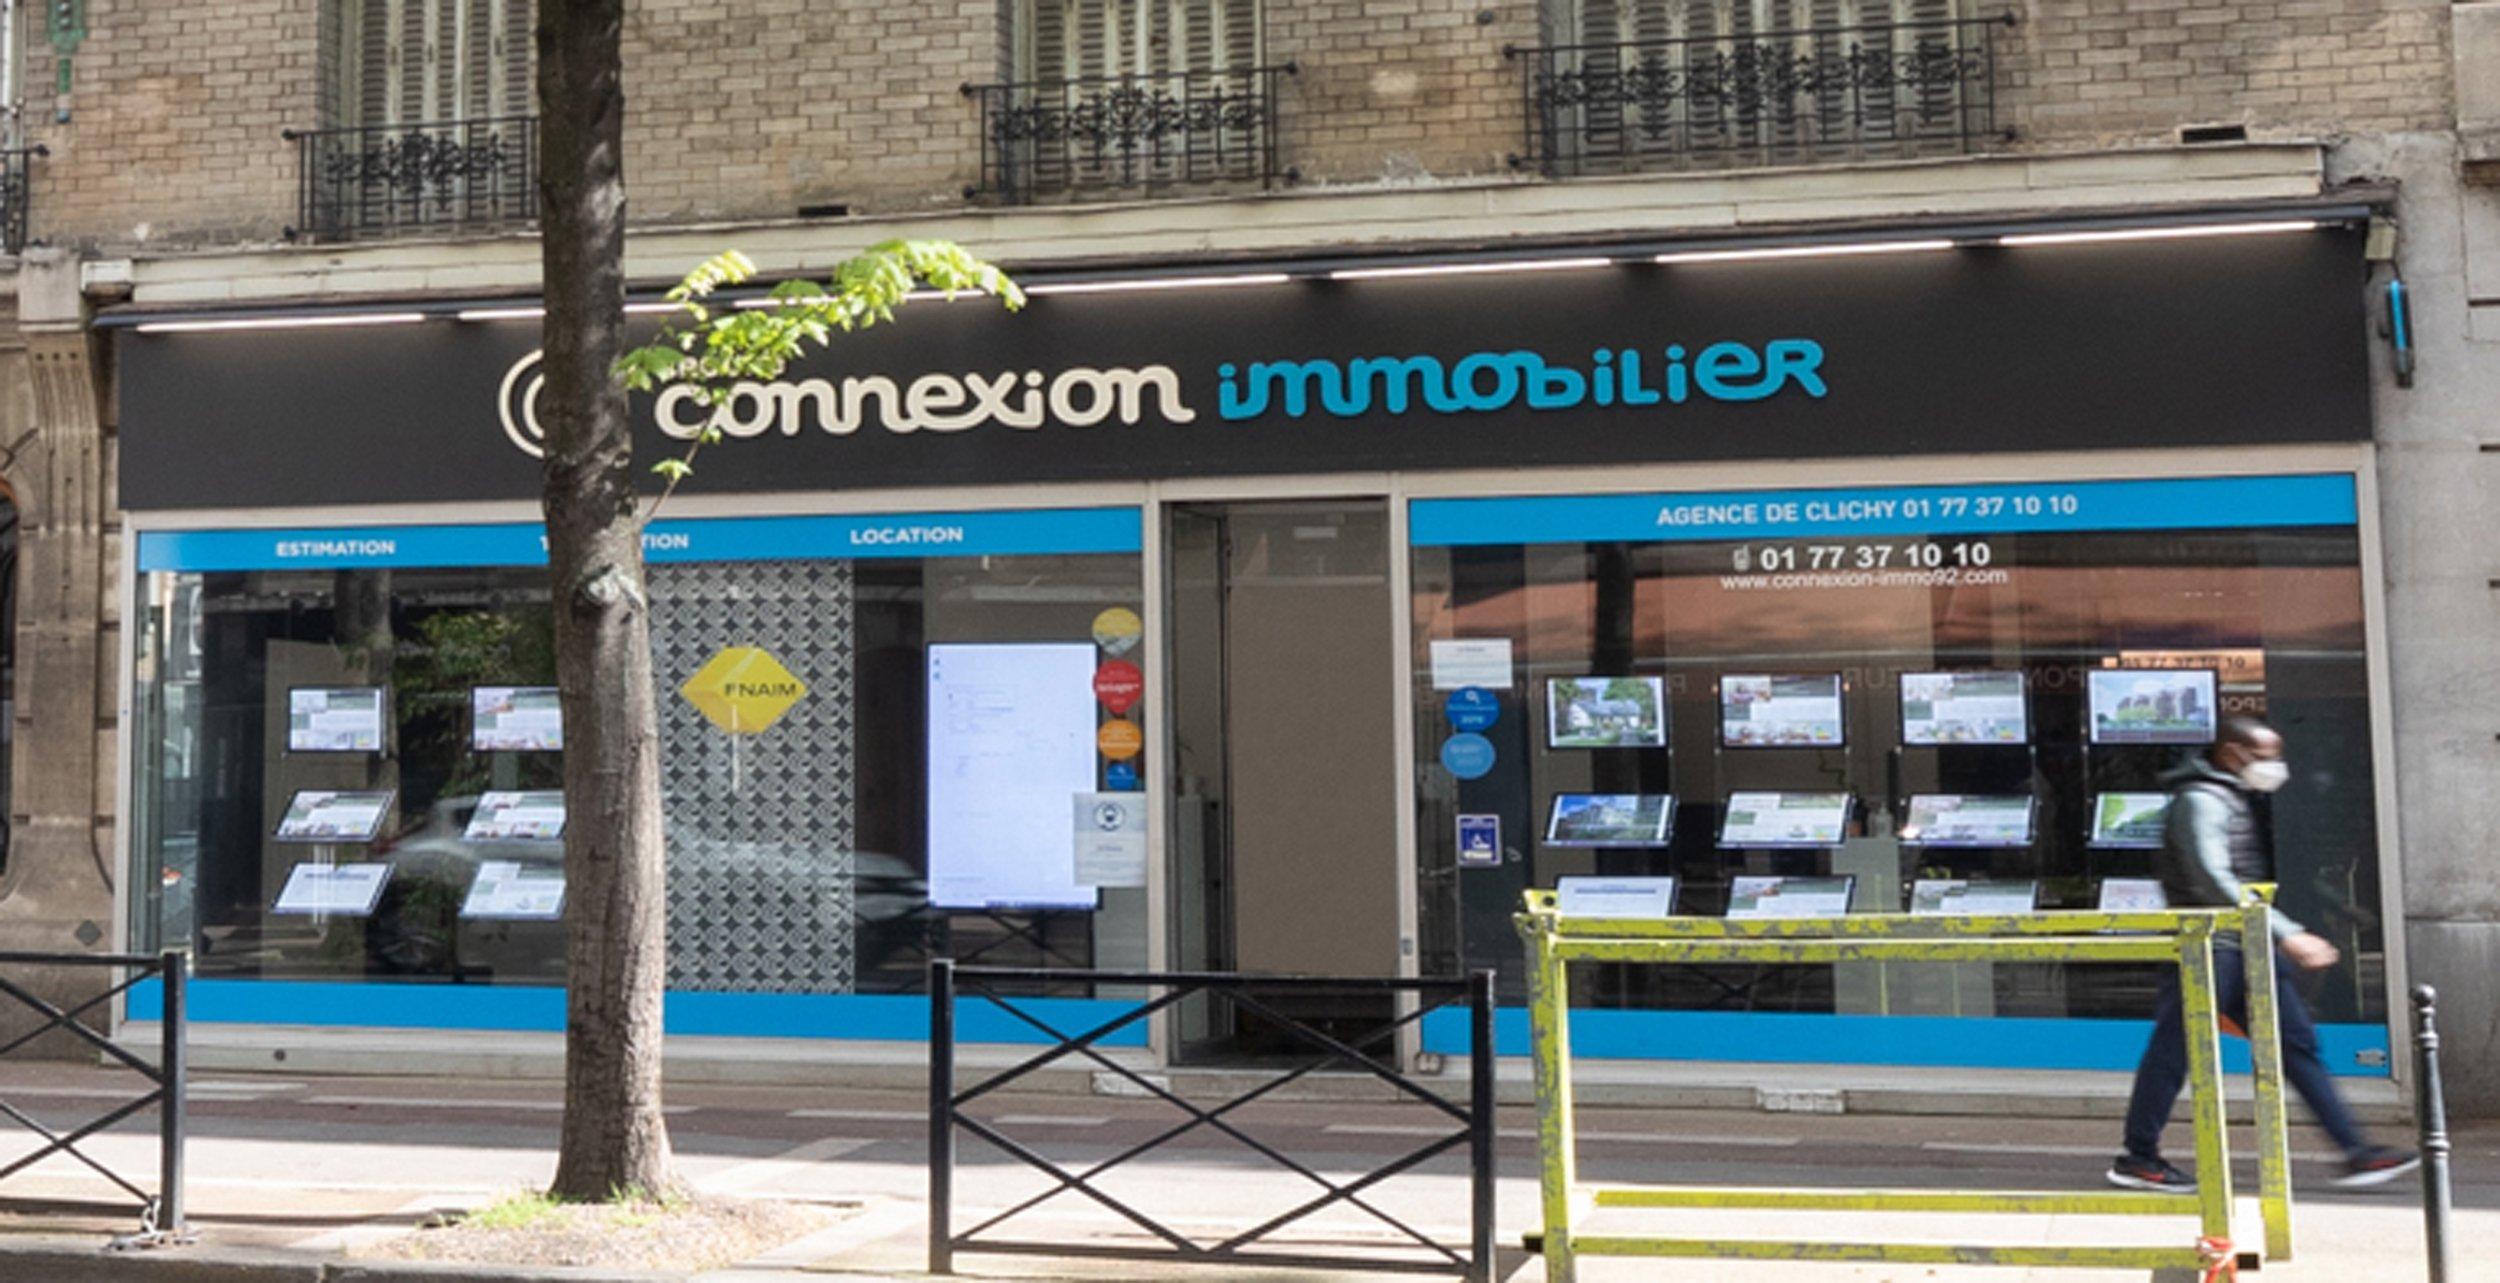 Connexion Immobilier clichy